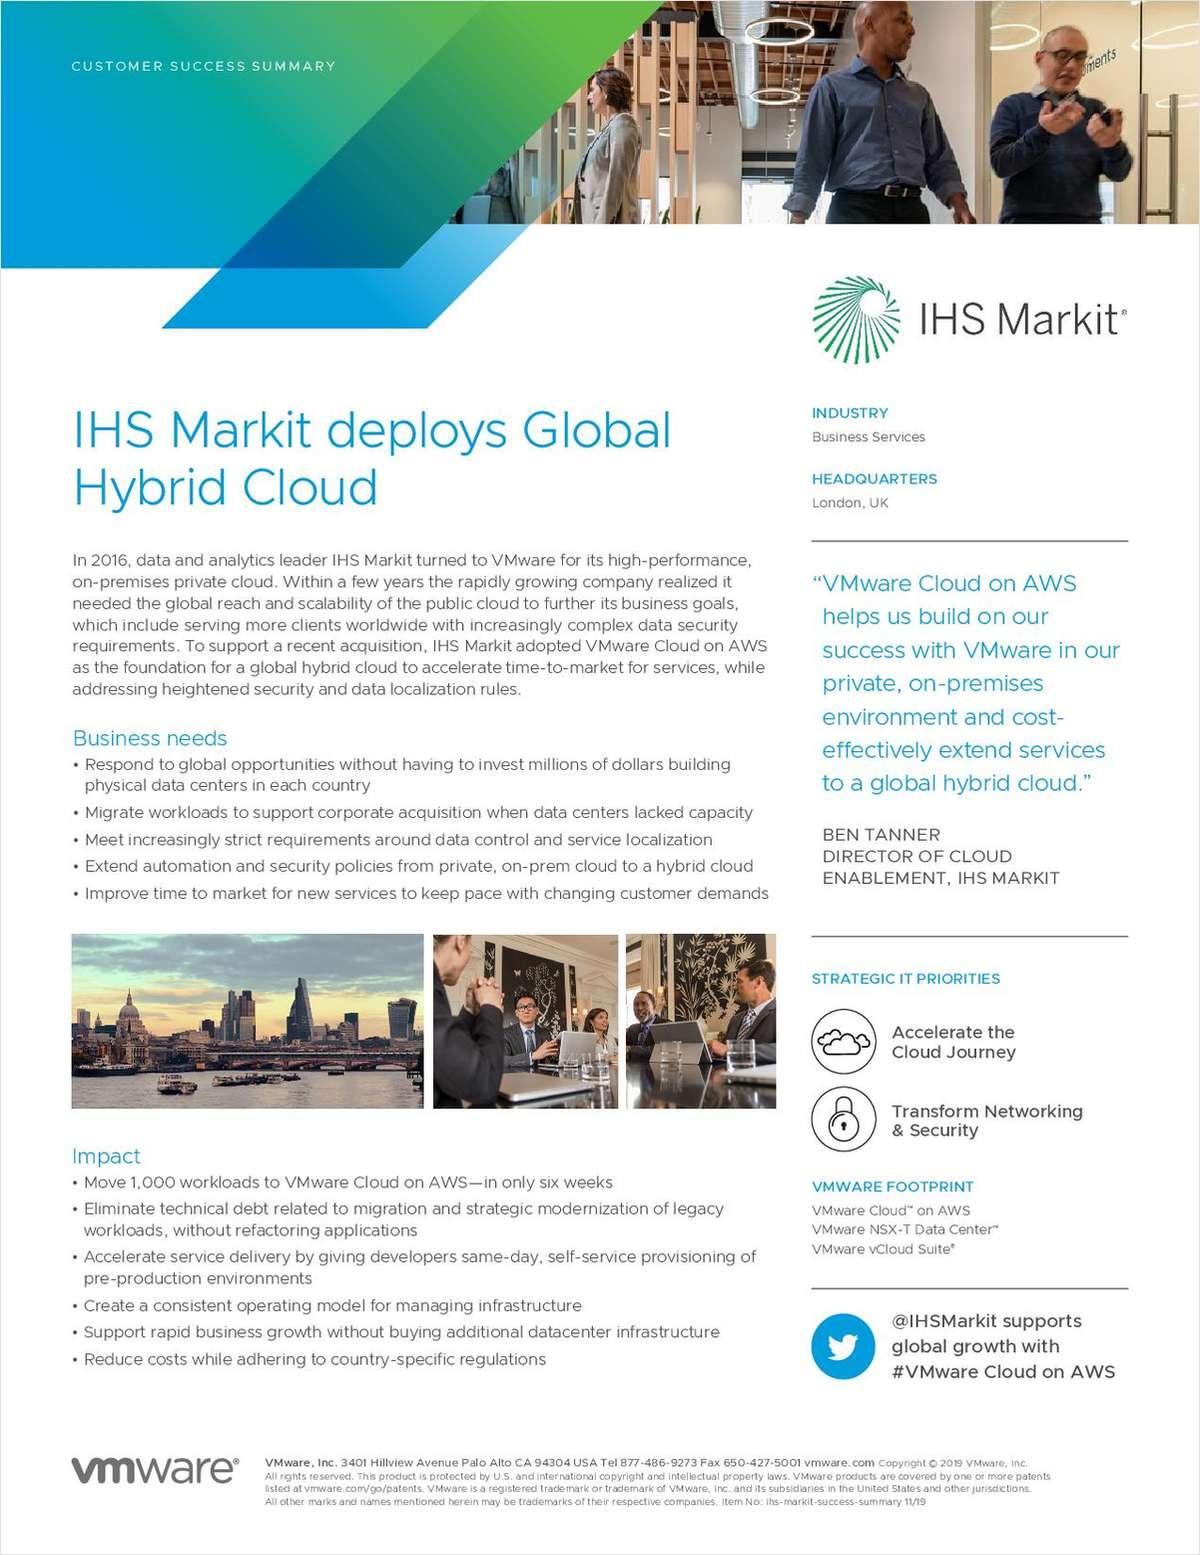 IHS Markit deploys Global Hybrid Cloud